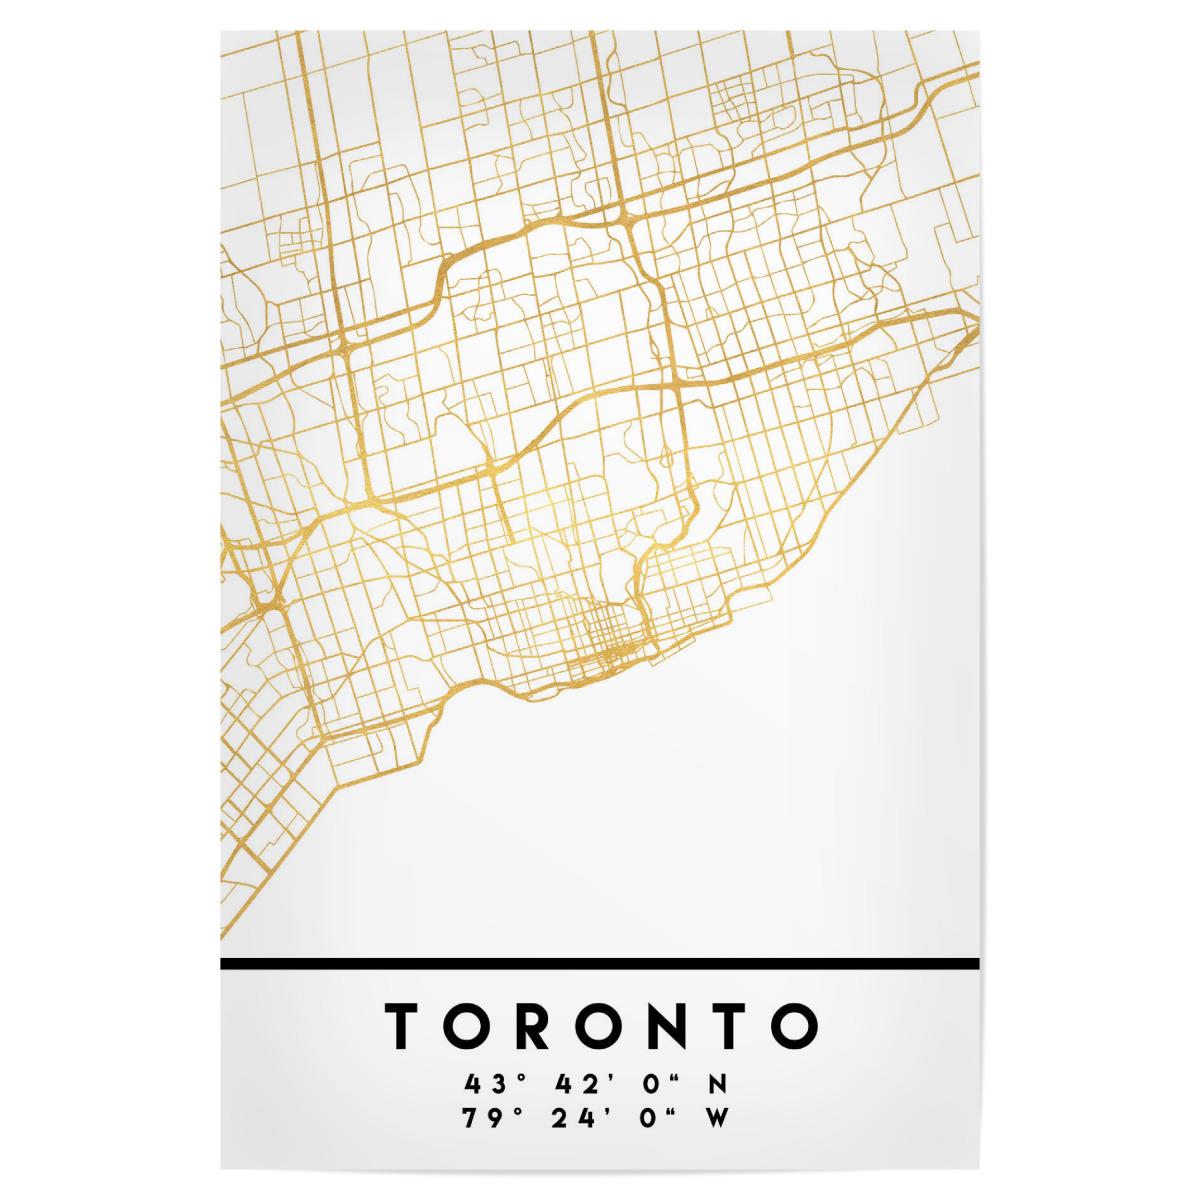 TORONTO CANADA STREET MAP ART als Poster bei artboxONE kaufen